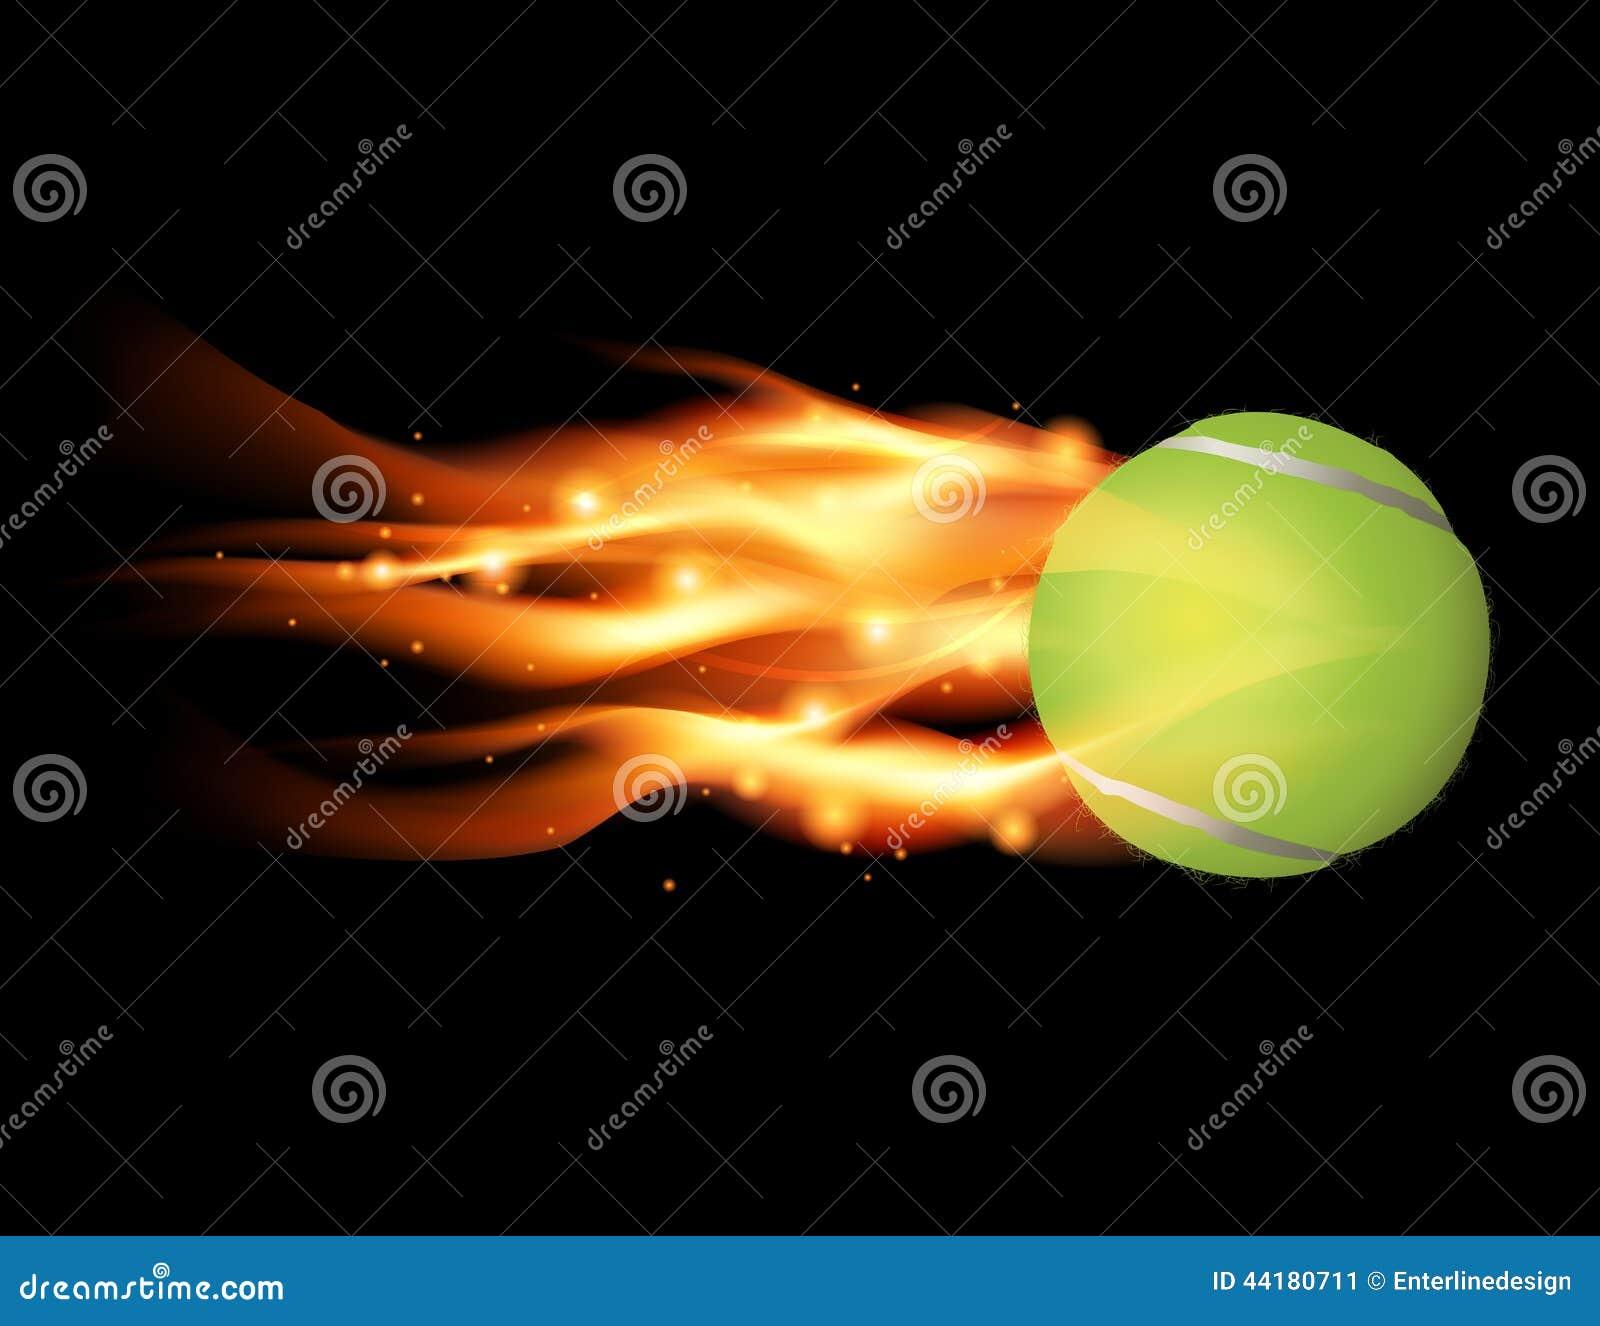 Tenis pelota stock de ilustracion ilustracion libre de stock de - Pelota De Tenis En El Ejemplo Del Fuego